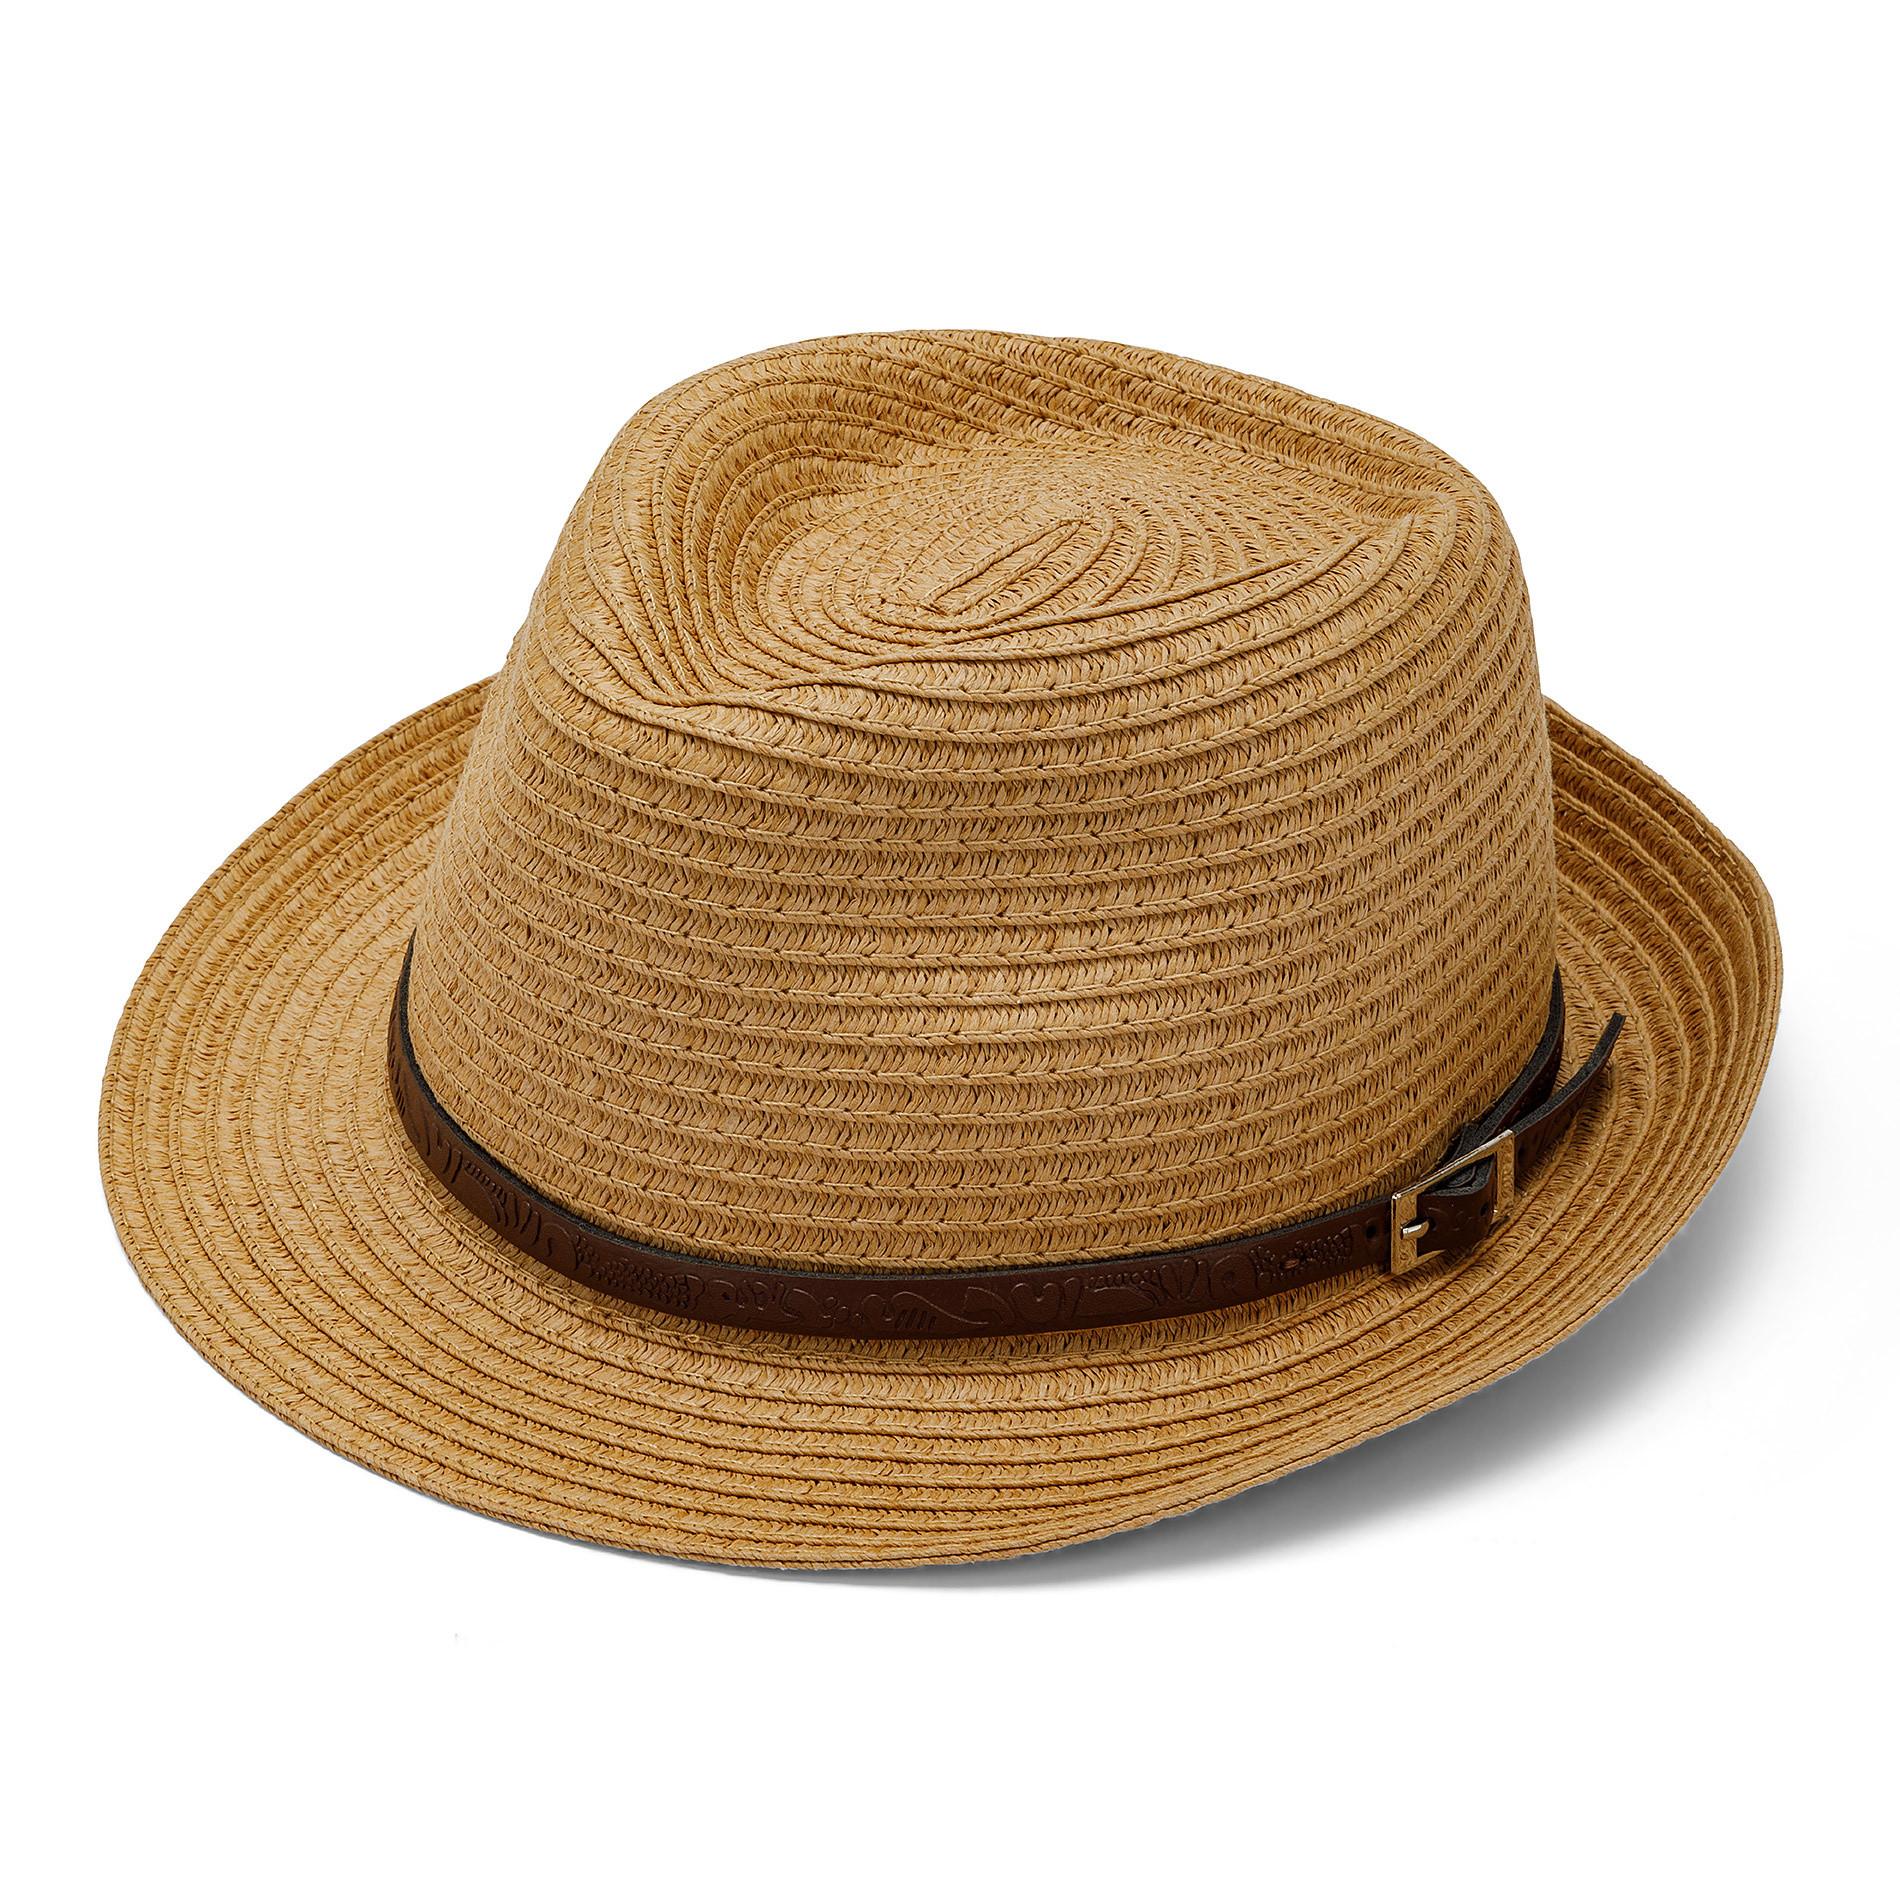 Cappello con cinturino Luca D'altieri, Giallo, large image number 0